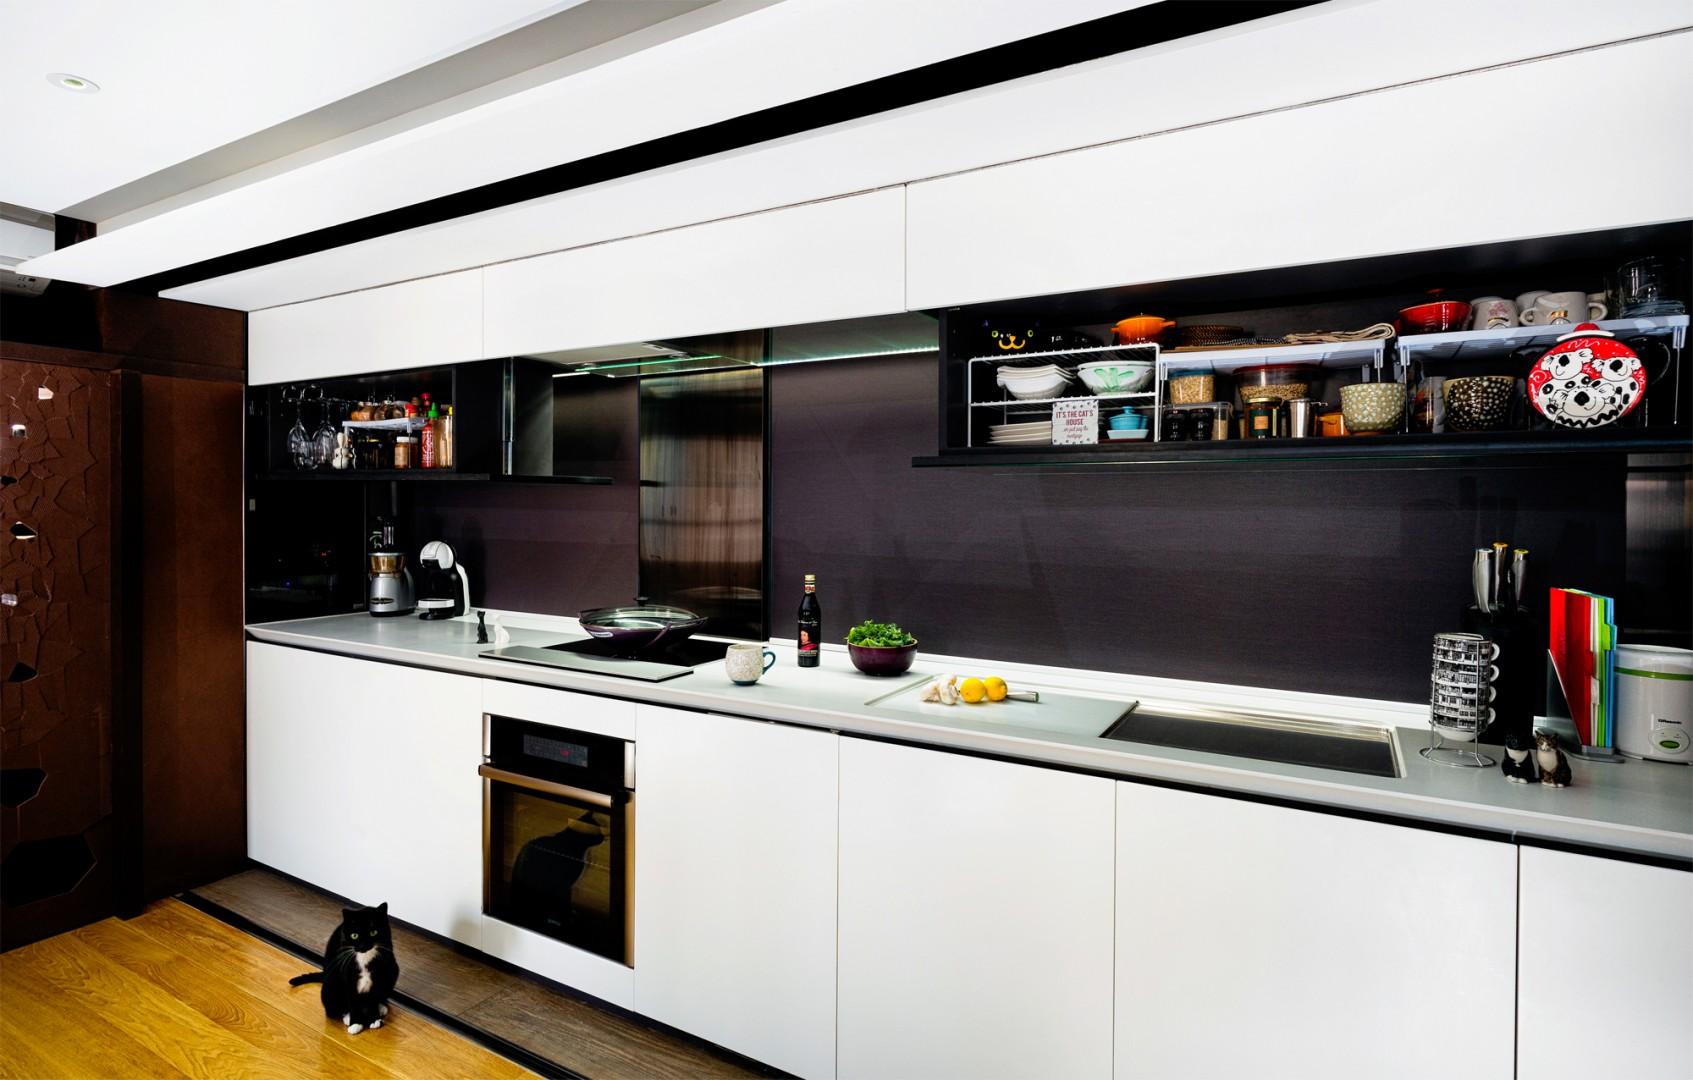 Designers work magic in a 309 sq ft Hong Kong microflat